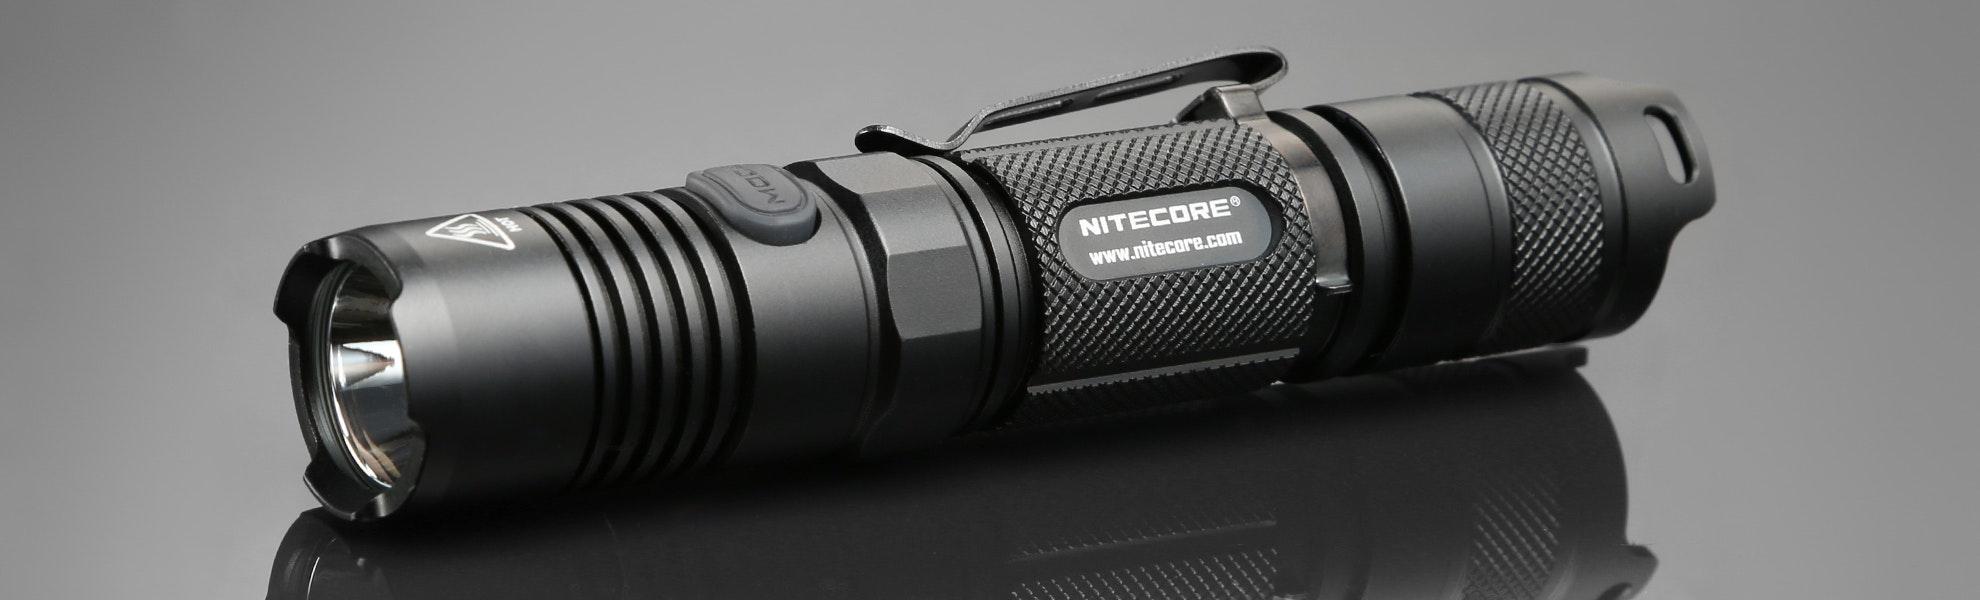 Nitecore P12GT 1000-lumen Flashlight (18650)